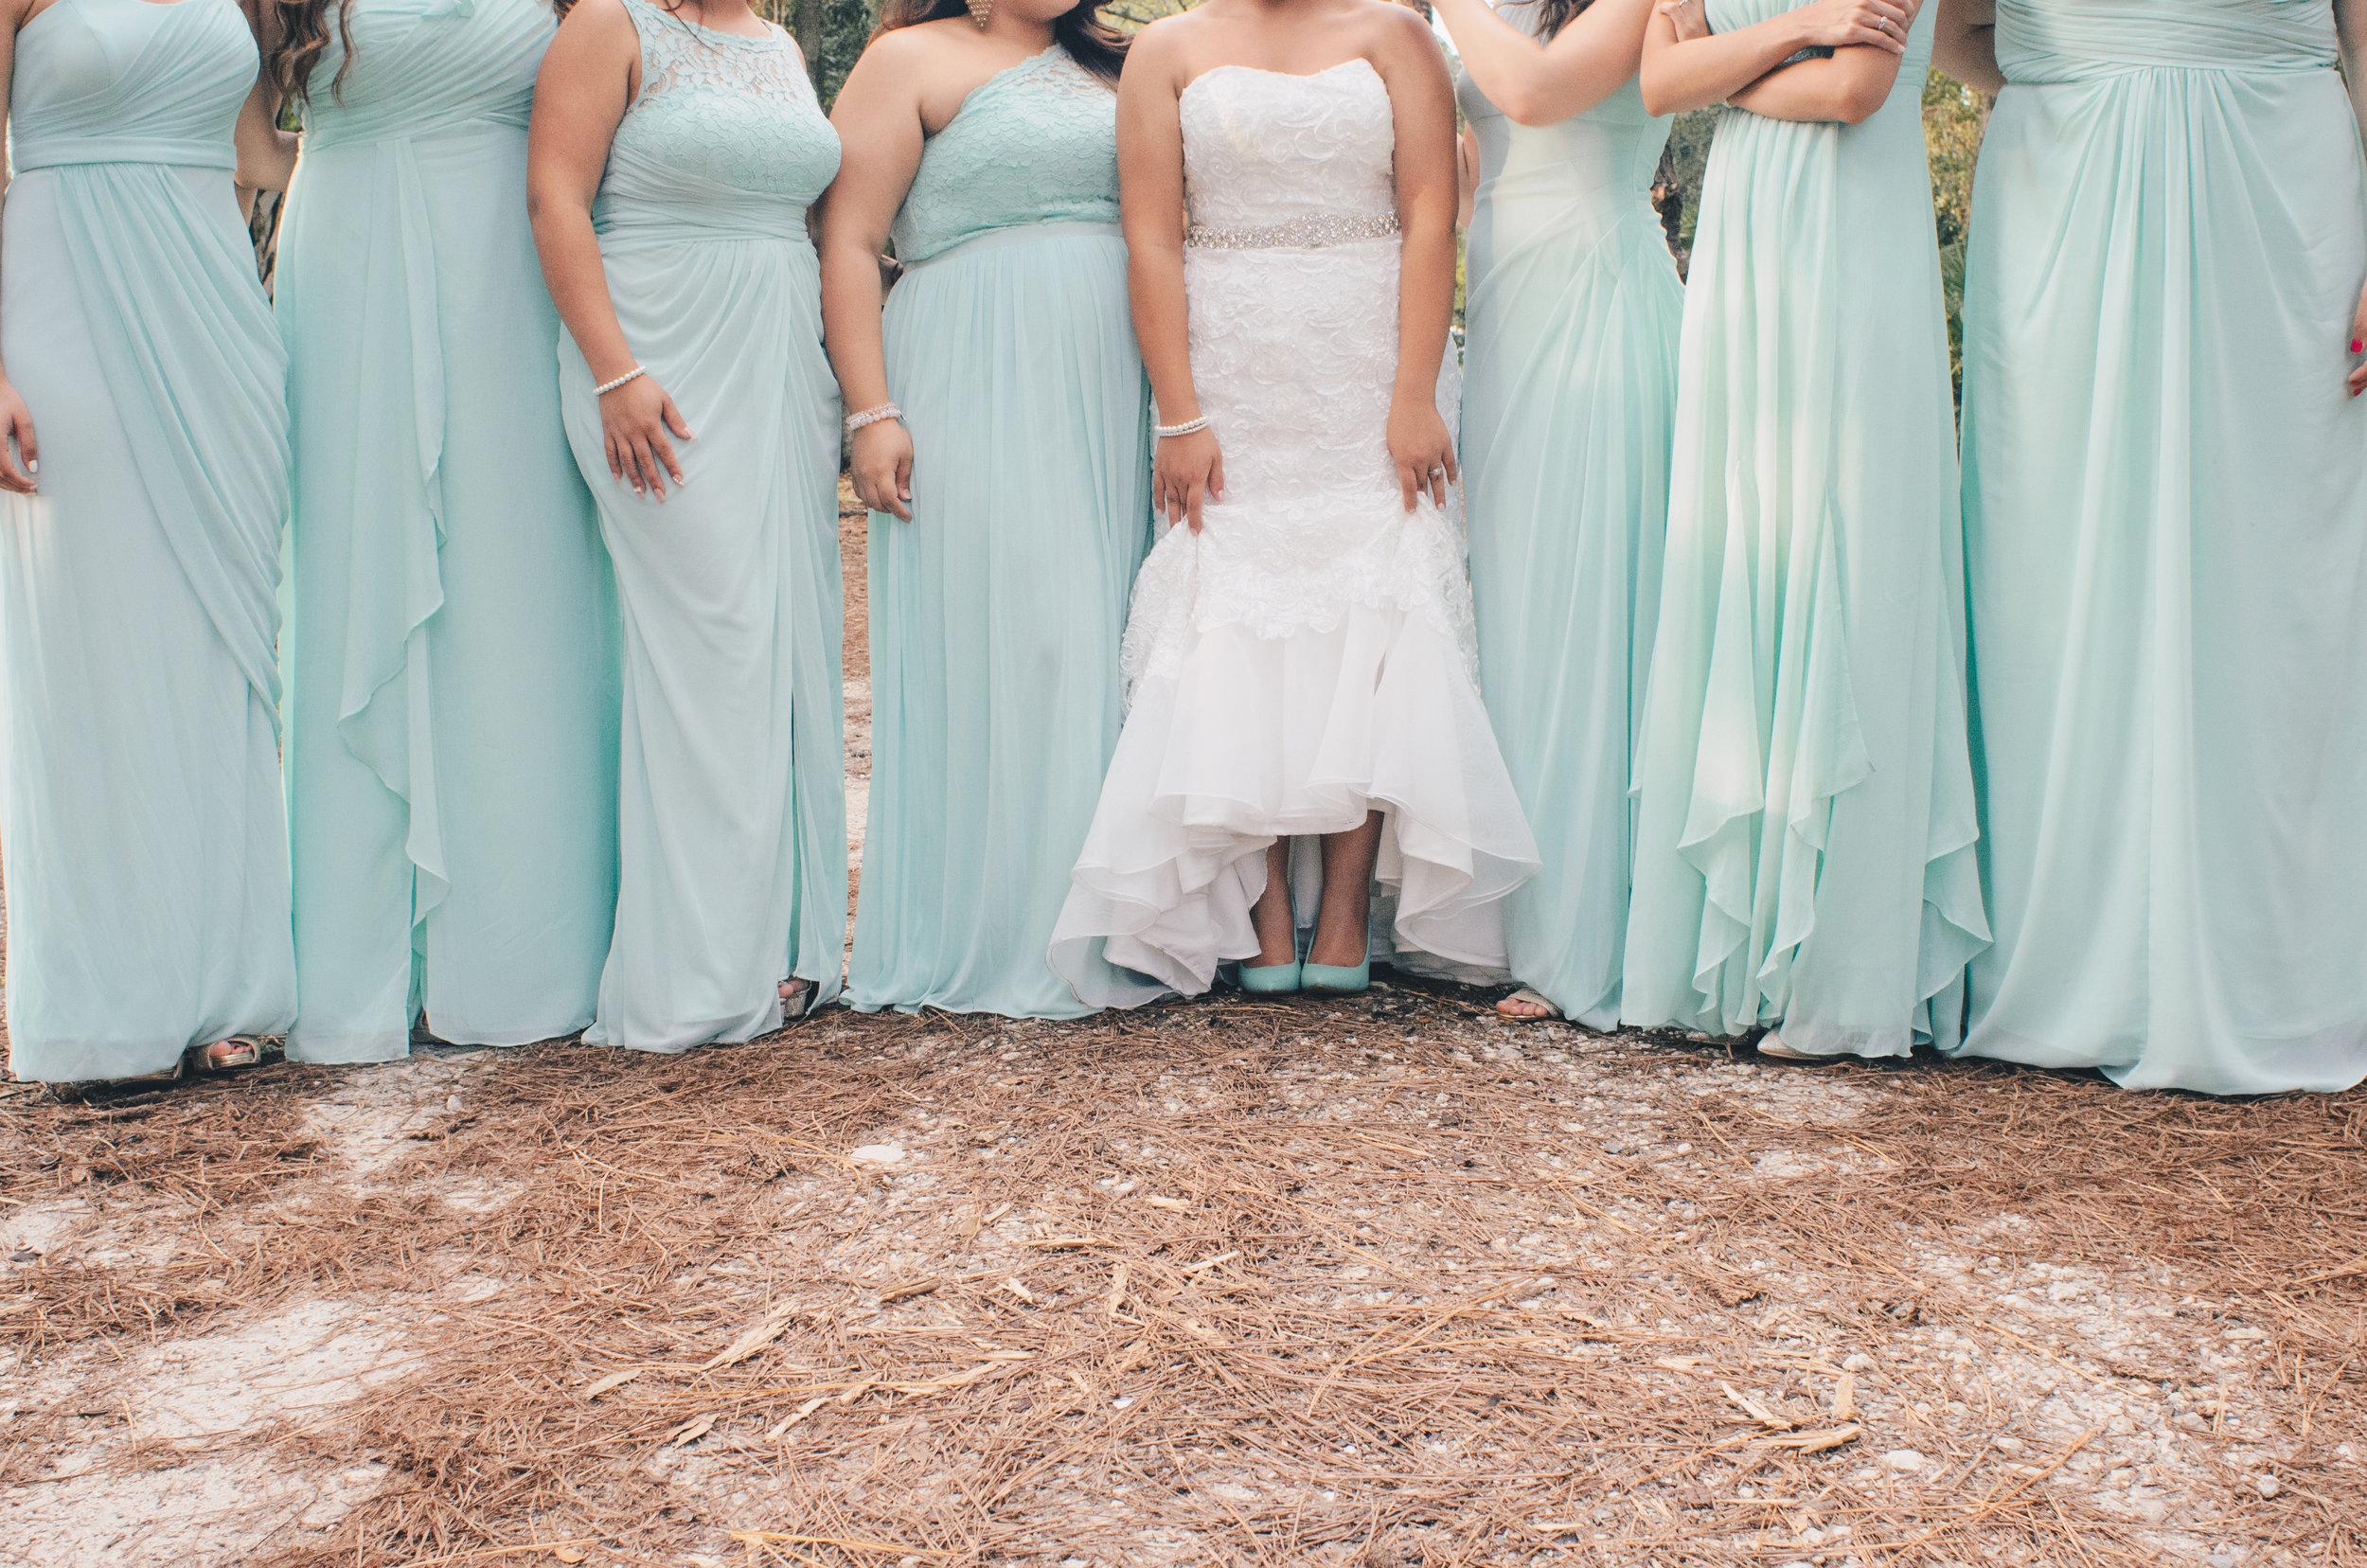 central-fl-christian-wedding-day-27.jpg